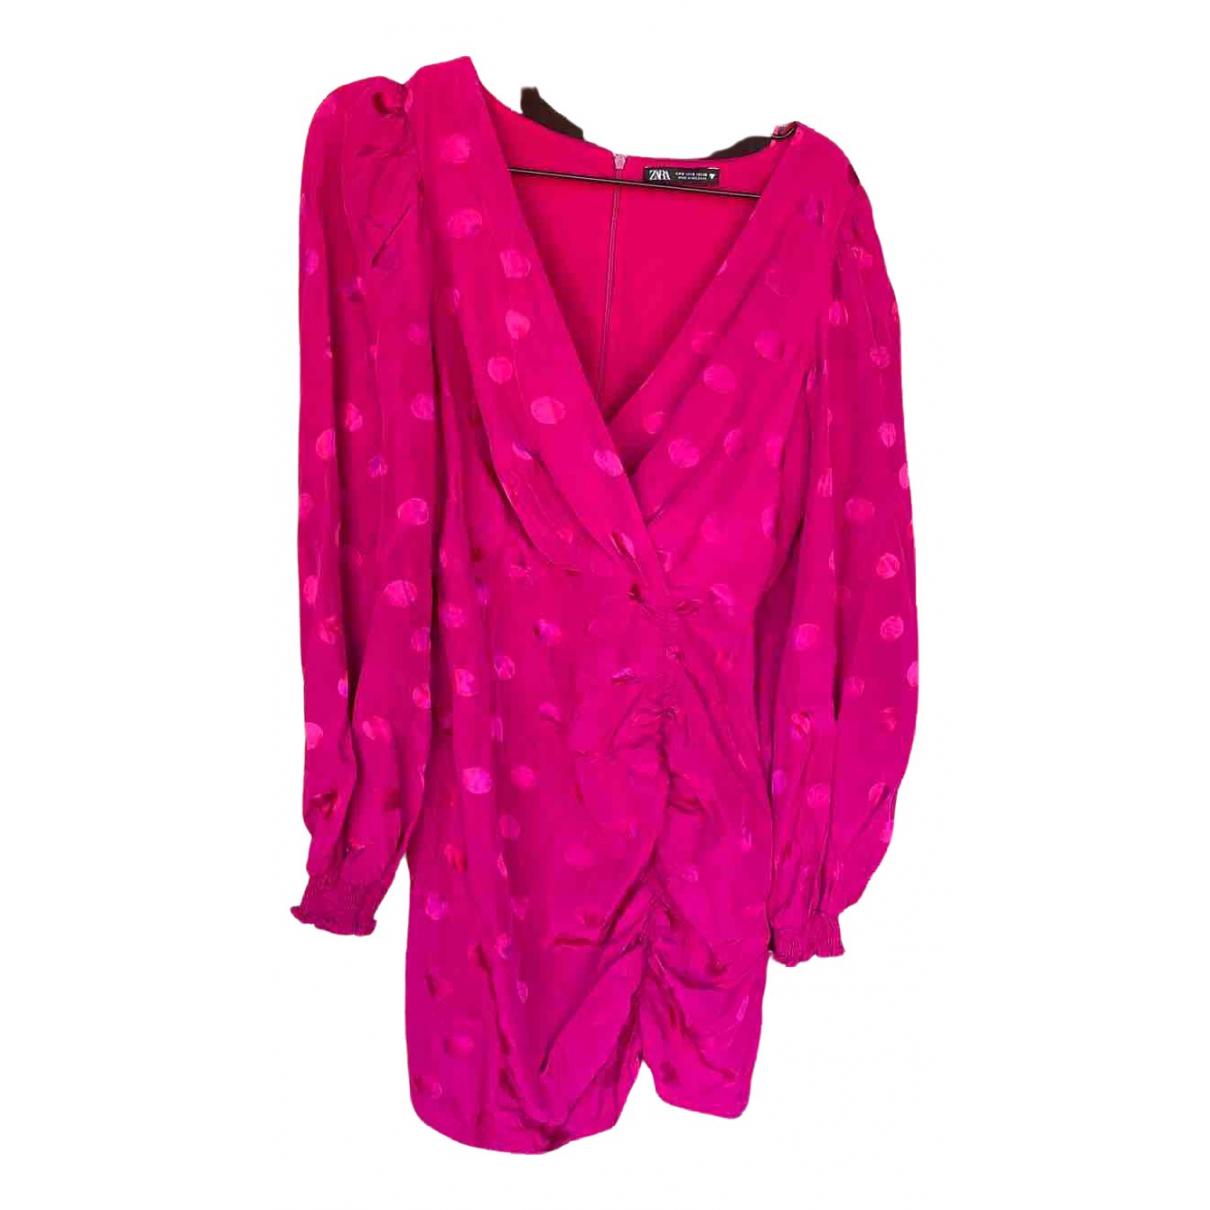 Zara \N dress for Women S International